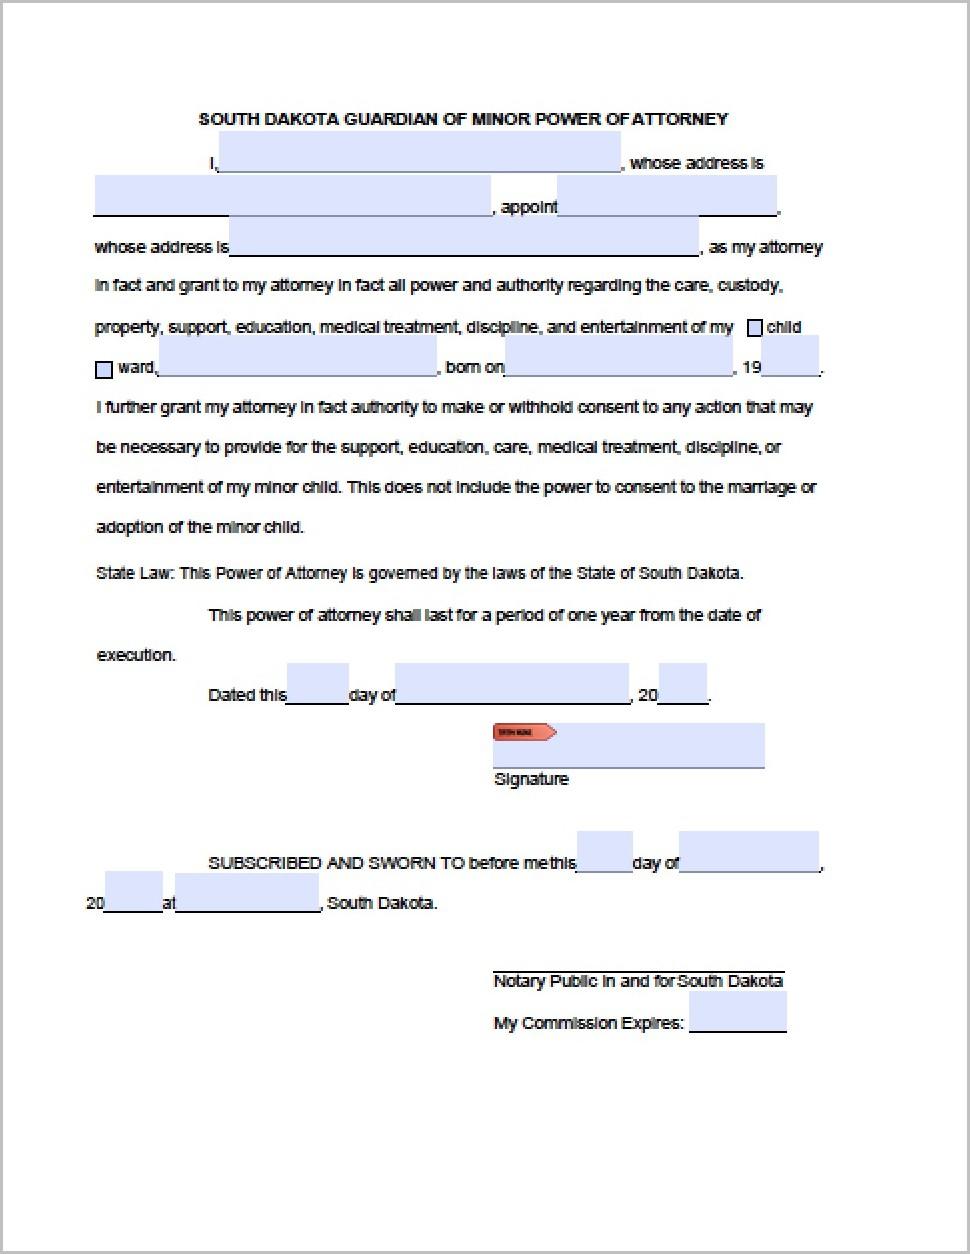 South Dakota Medicaid Application Form